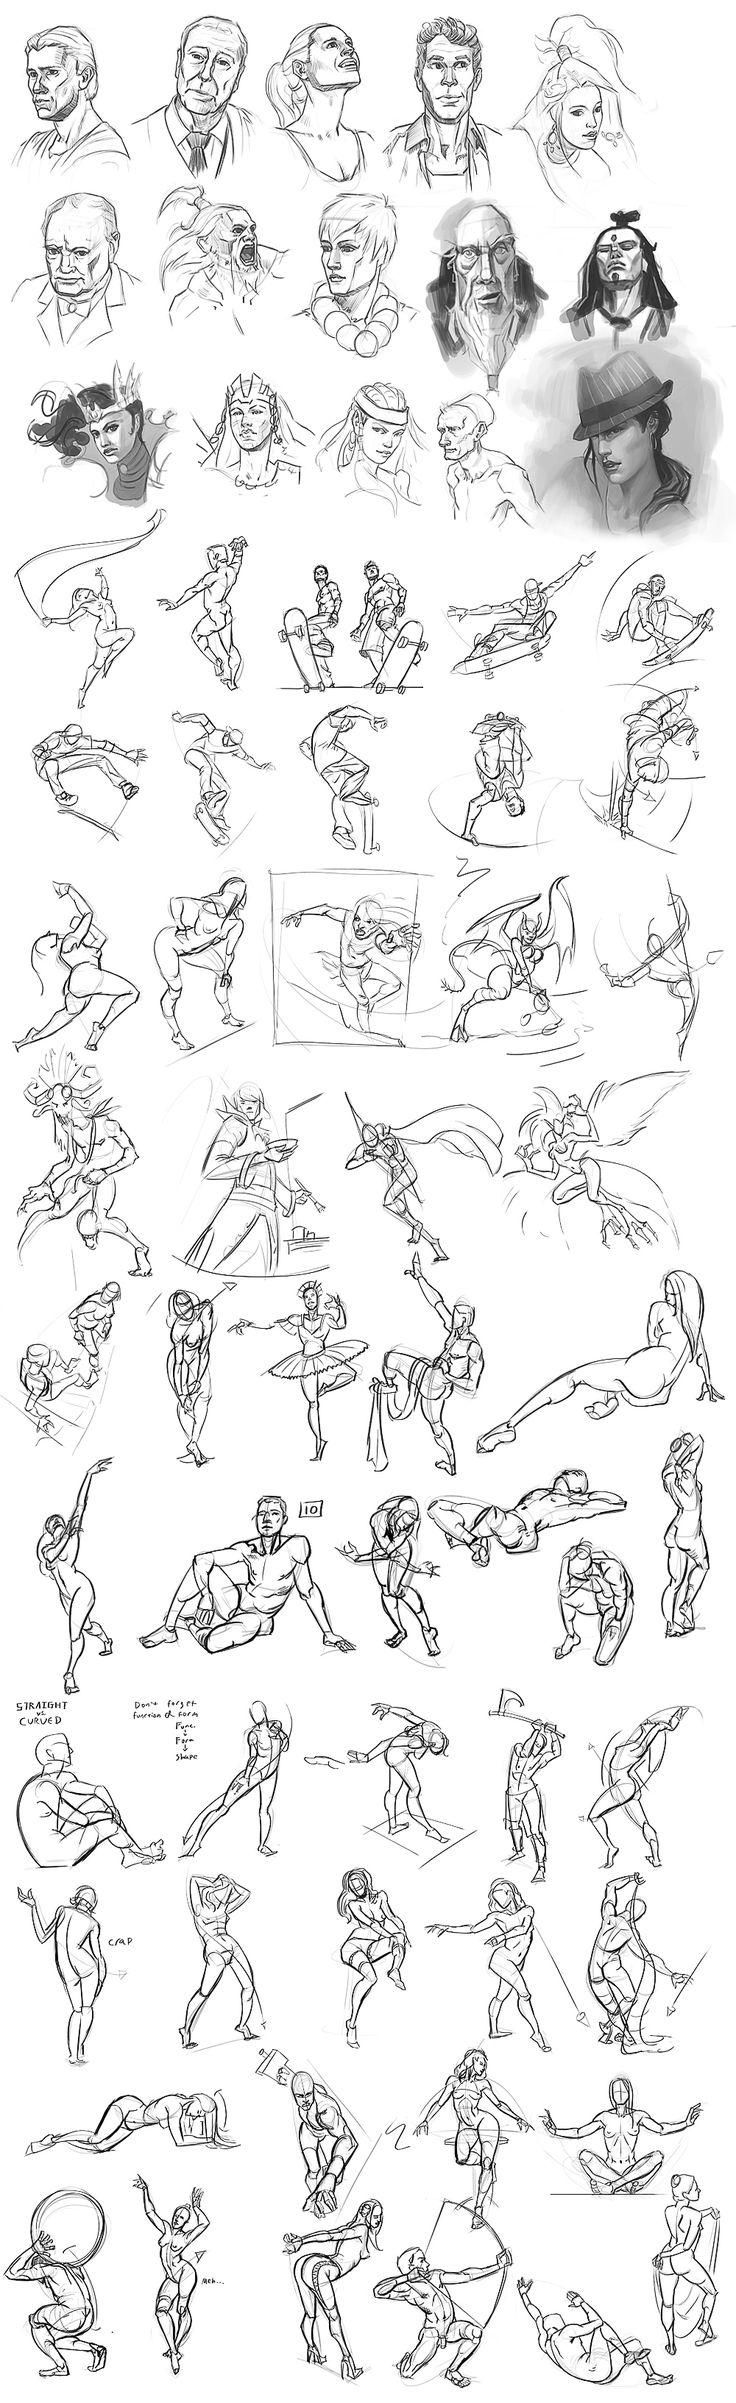 Figure Drawing 014 by Andantonius.deviantart.com on @deviantART